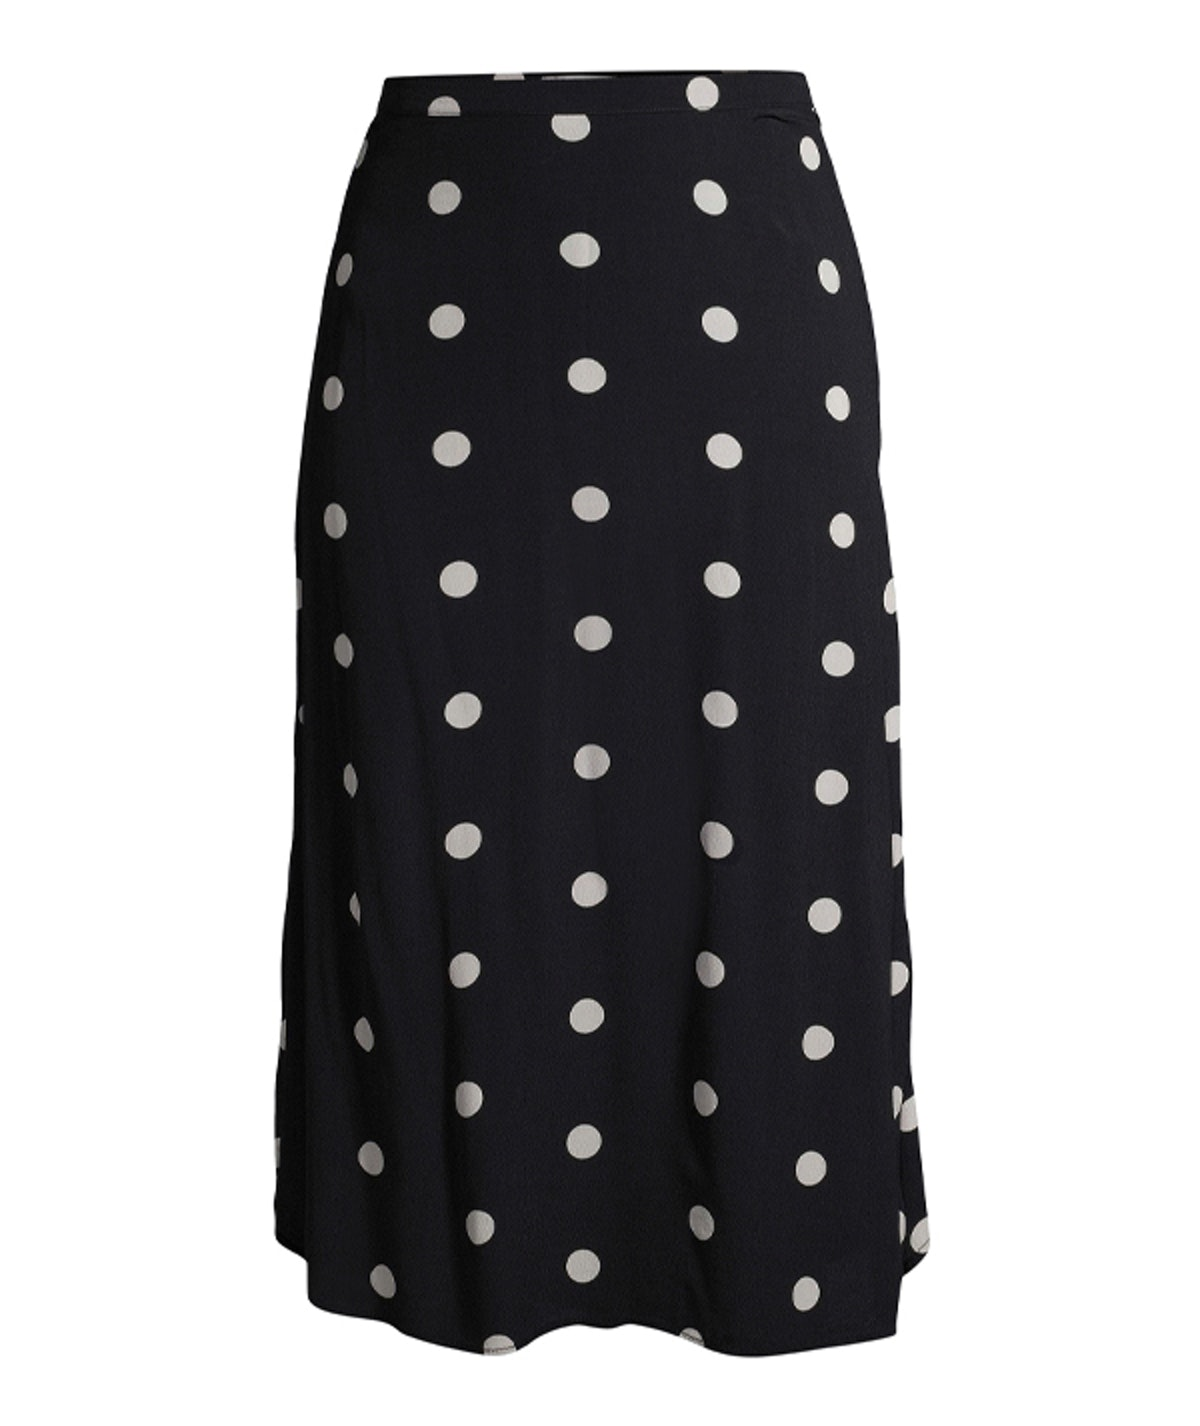 Viscose Slip Skirt